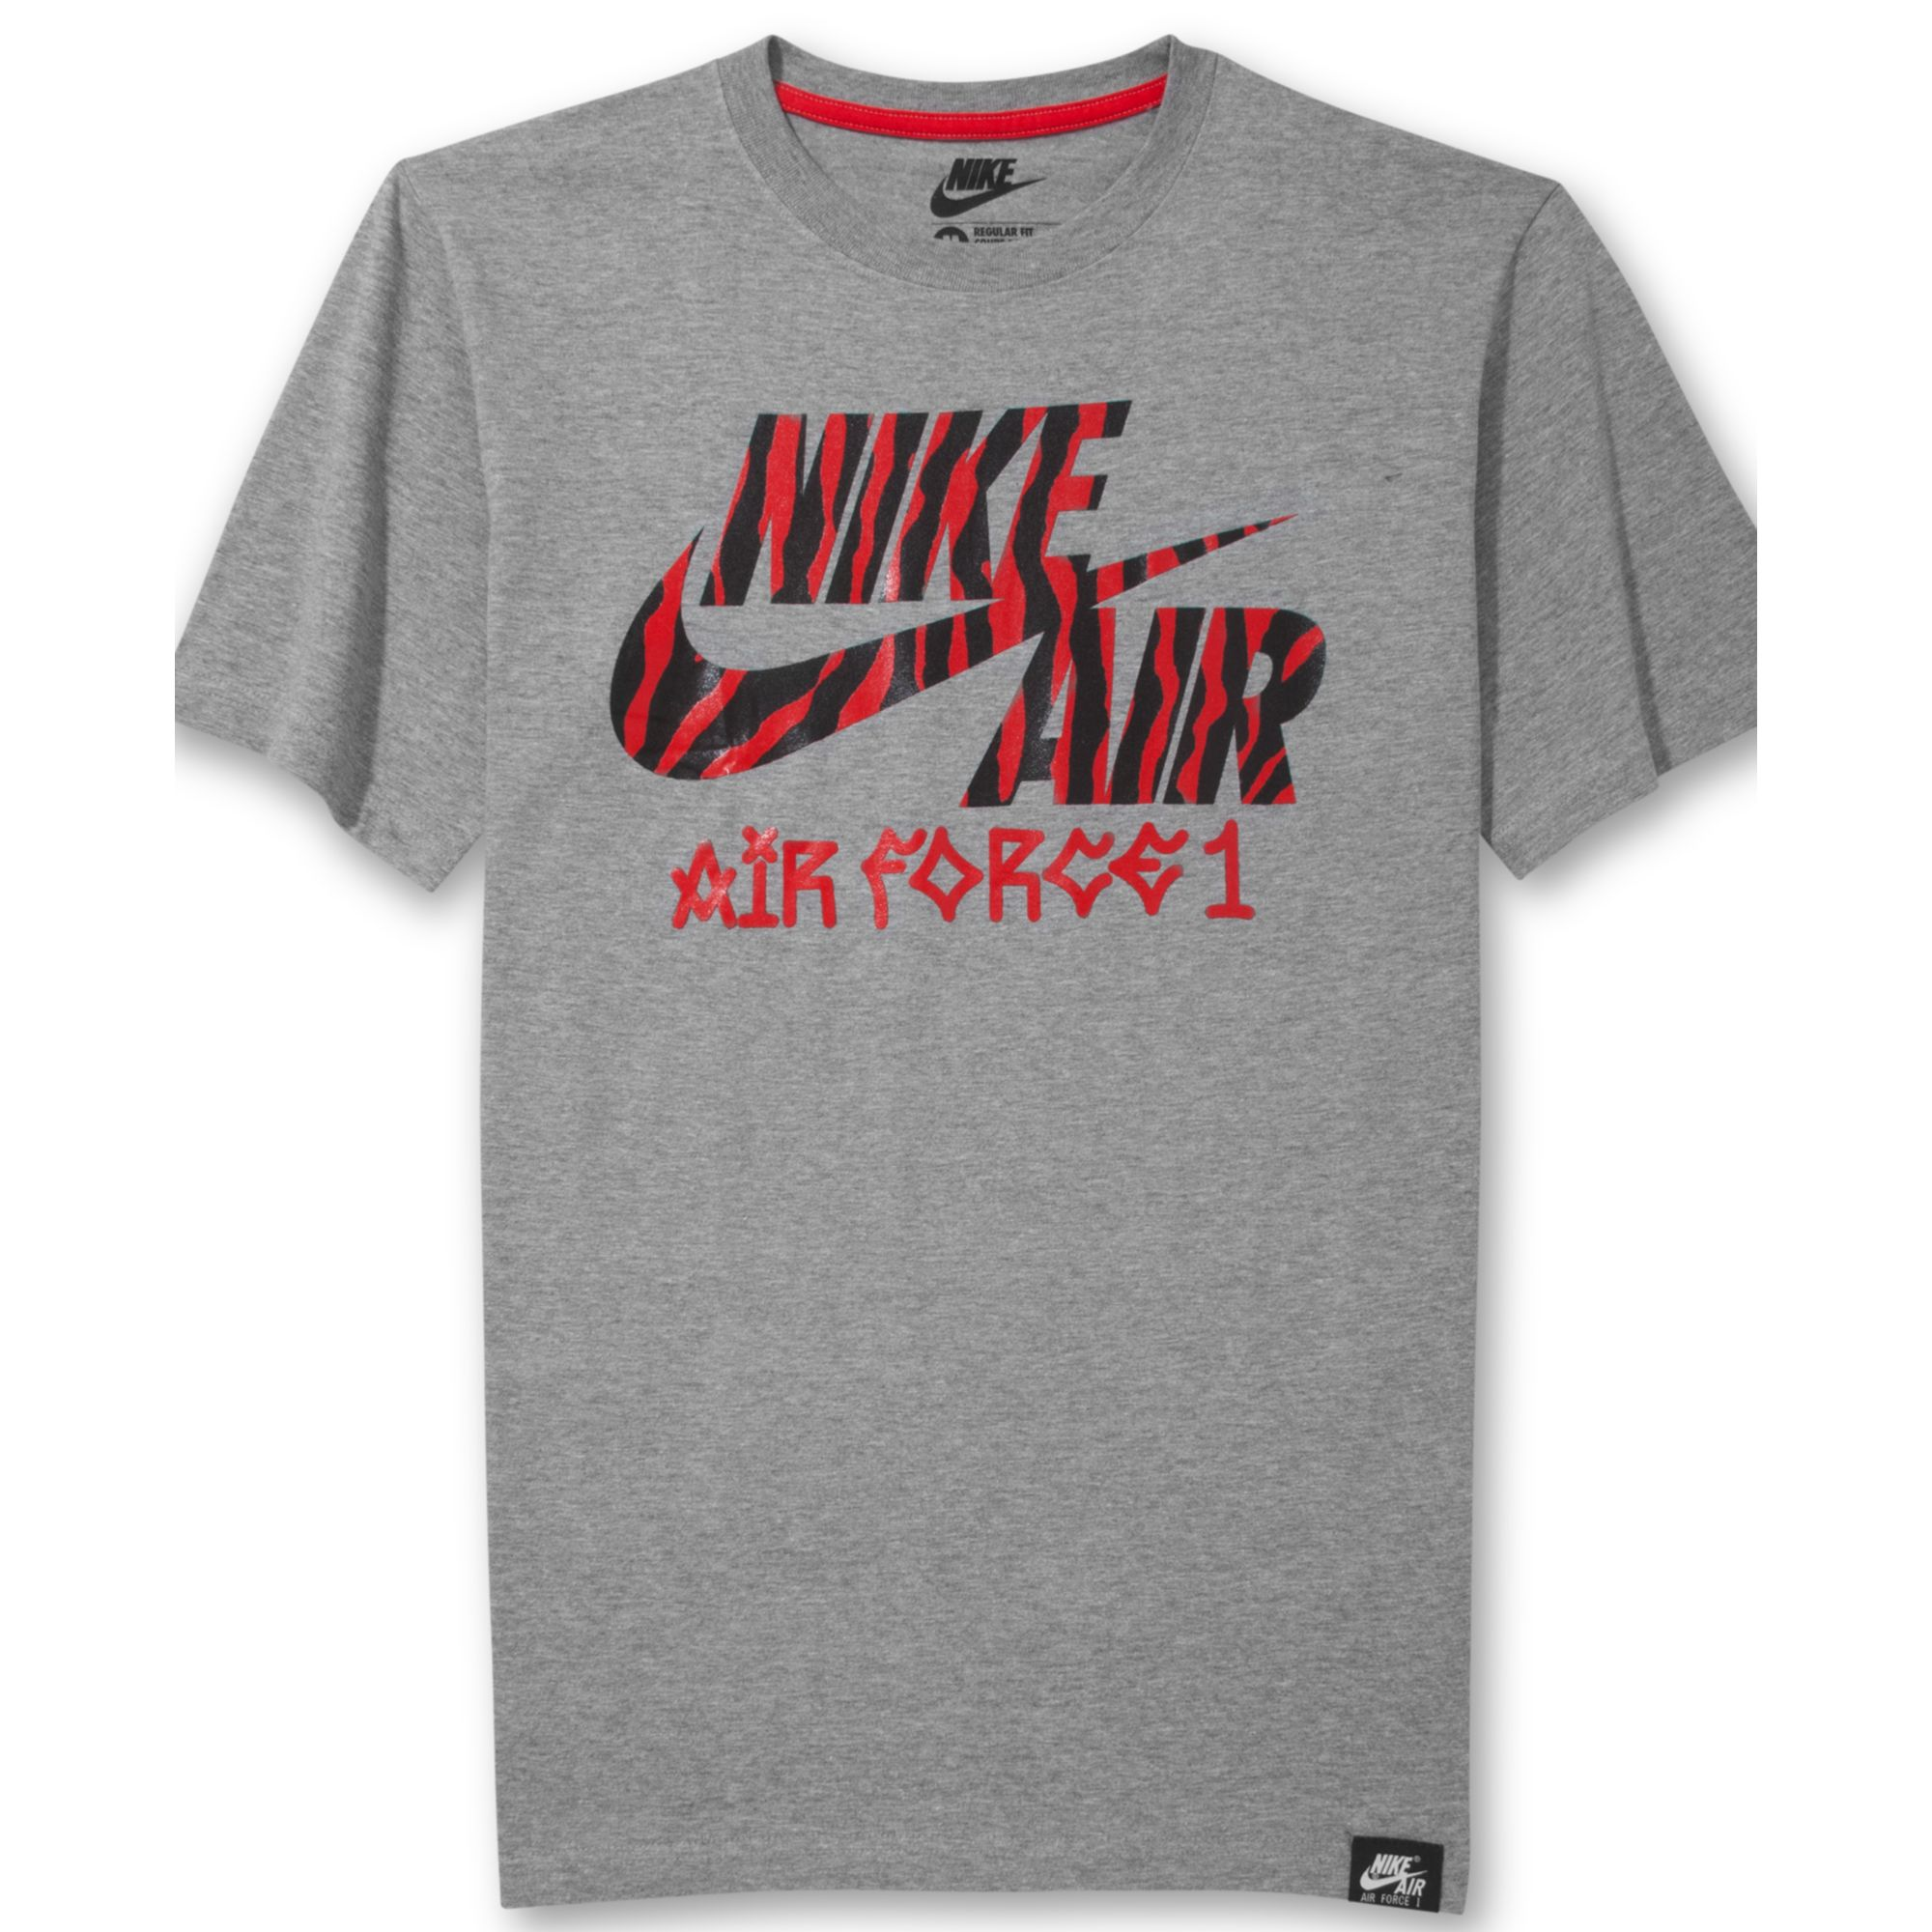 nike air force t shirt